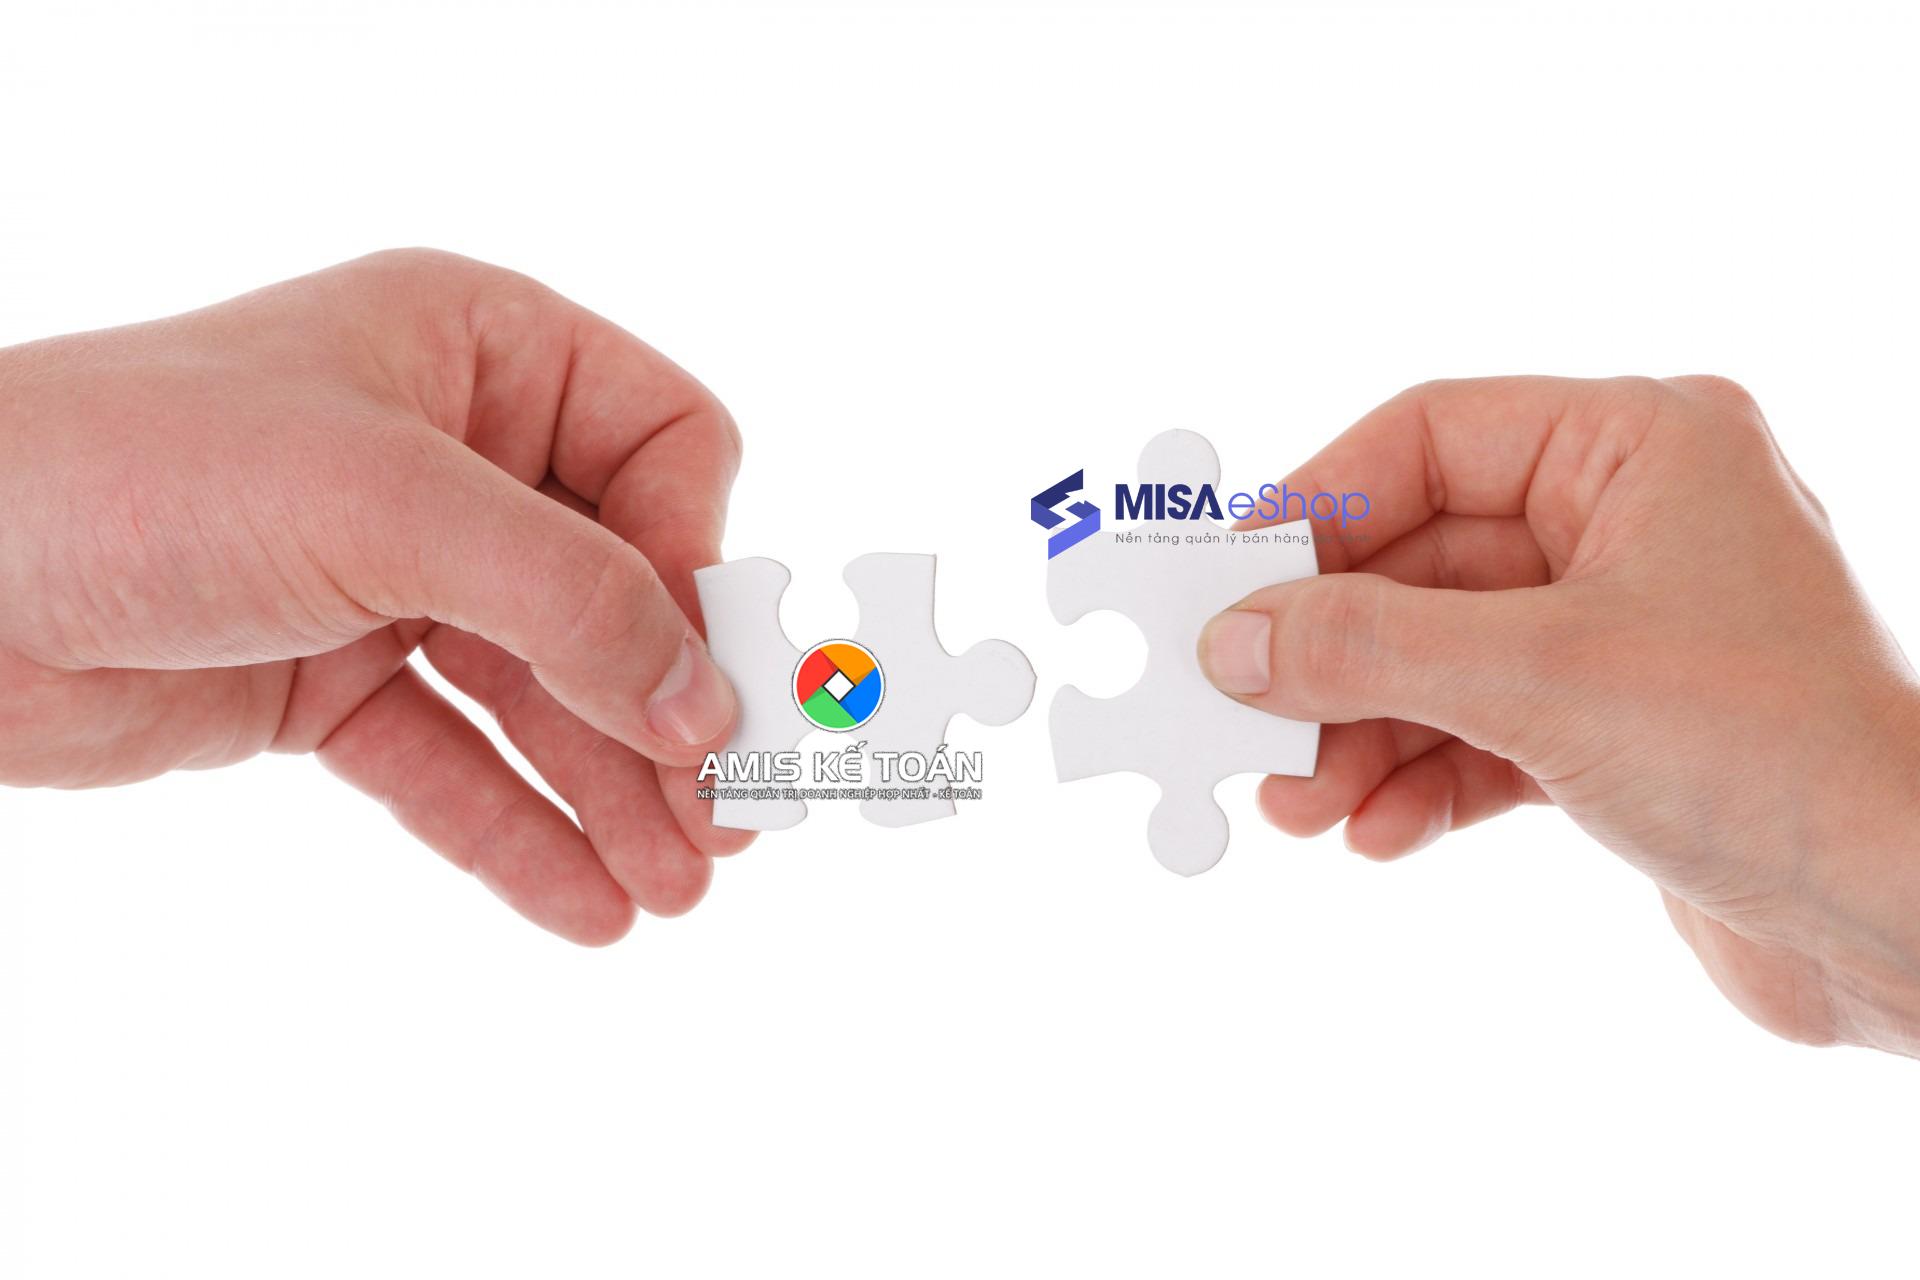 misa eshop kết nối amis kế toán